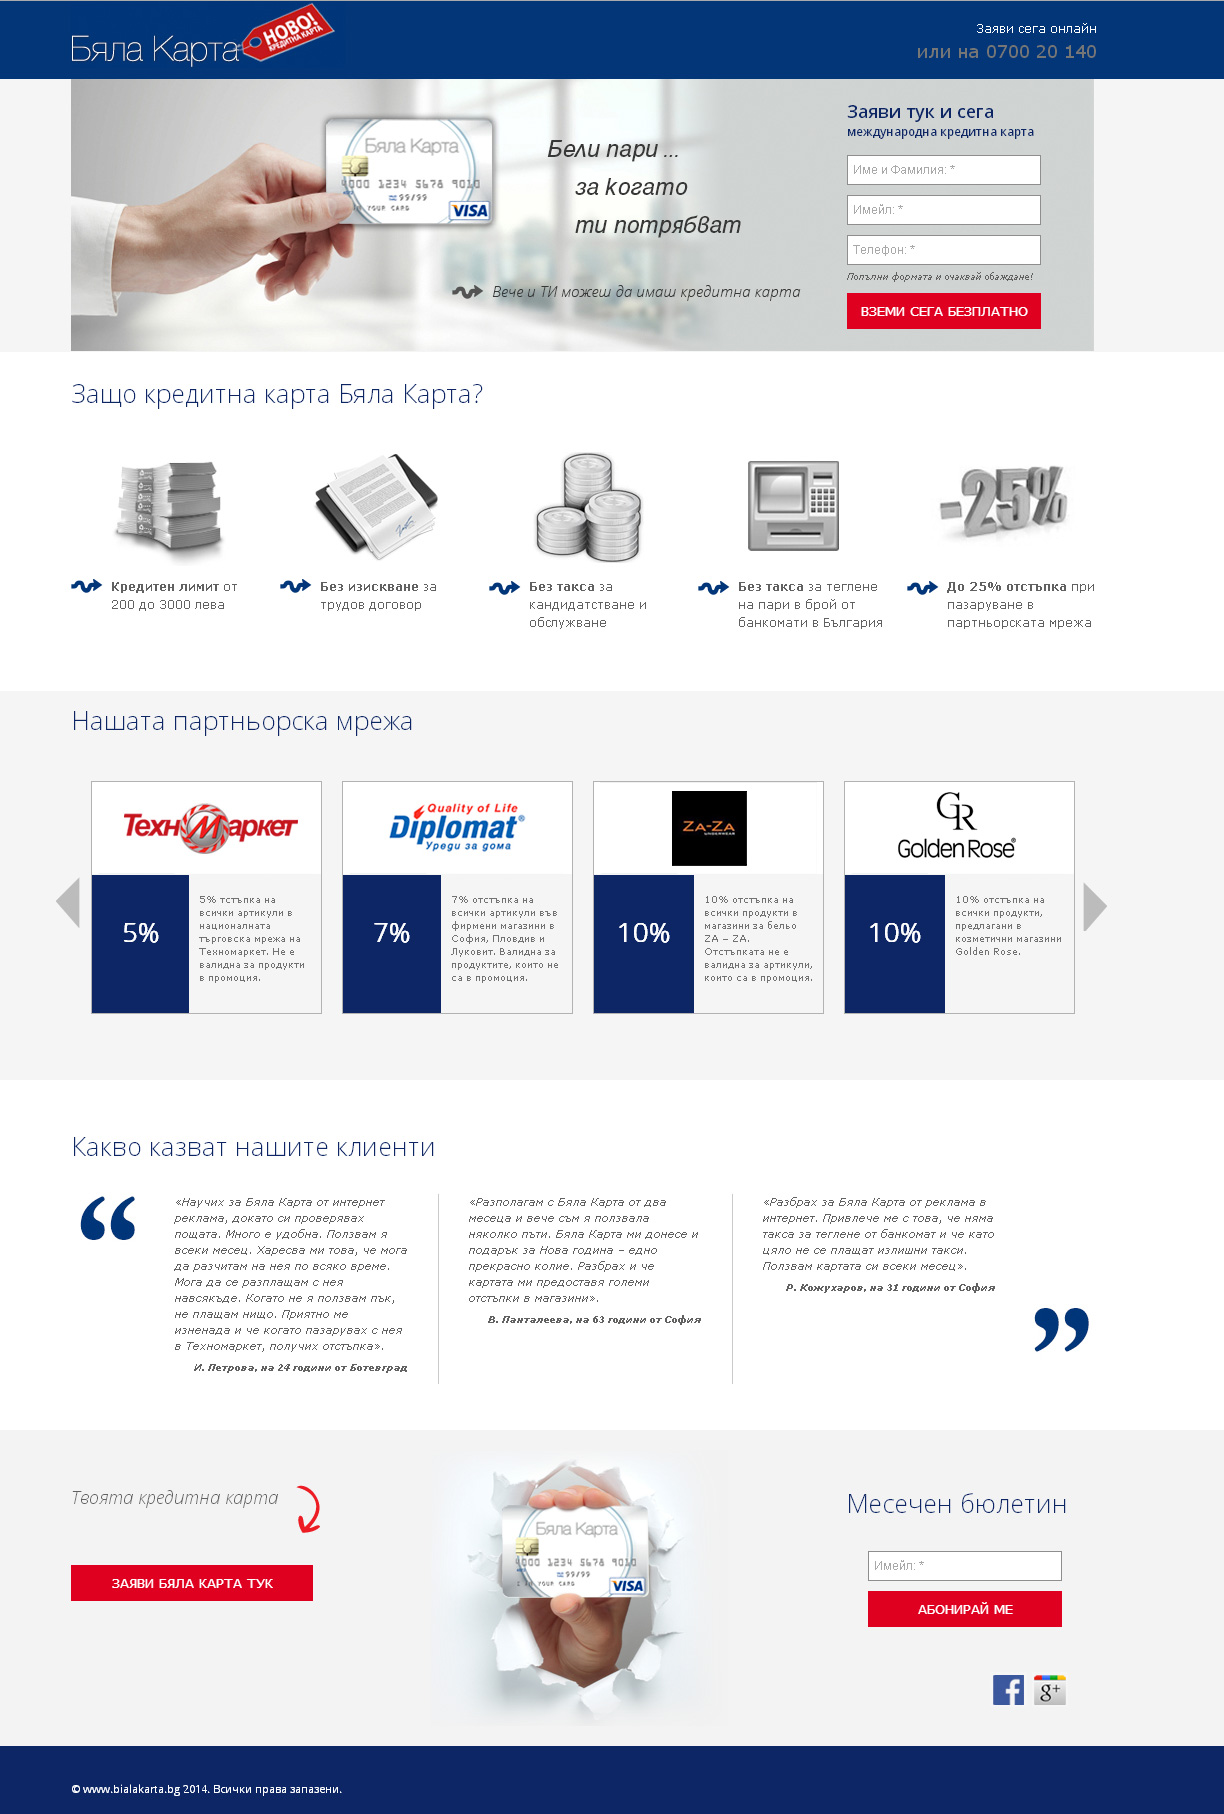 Portfolio Lending Stranici Byala Karta Internet Reklama